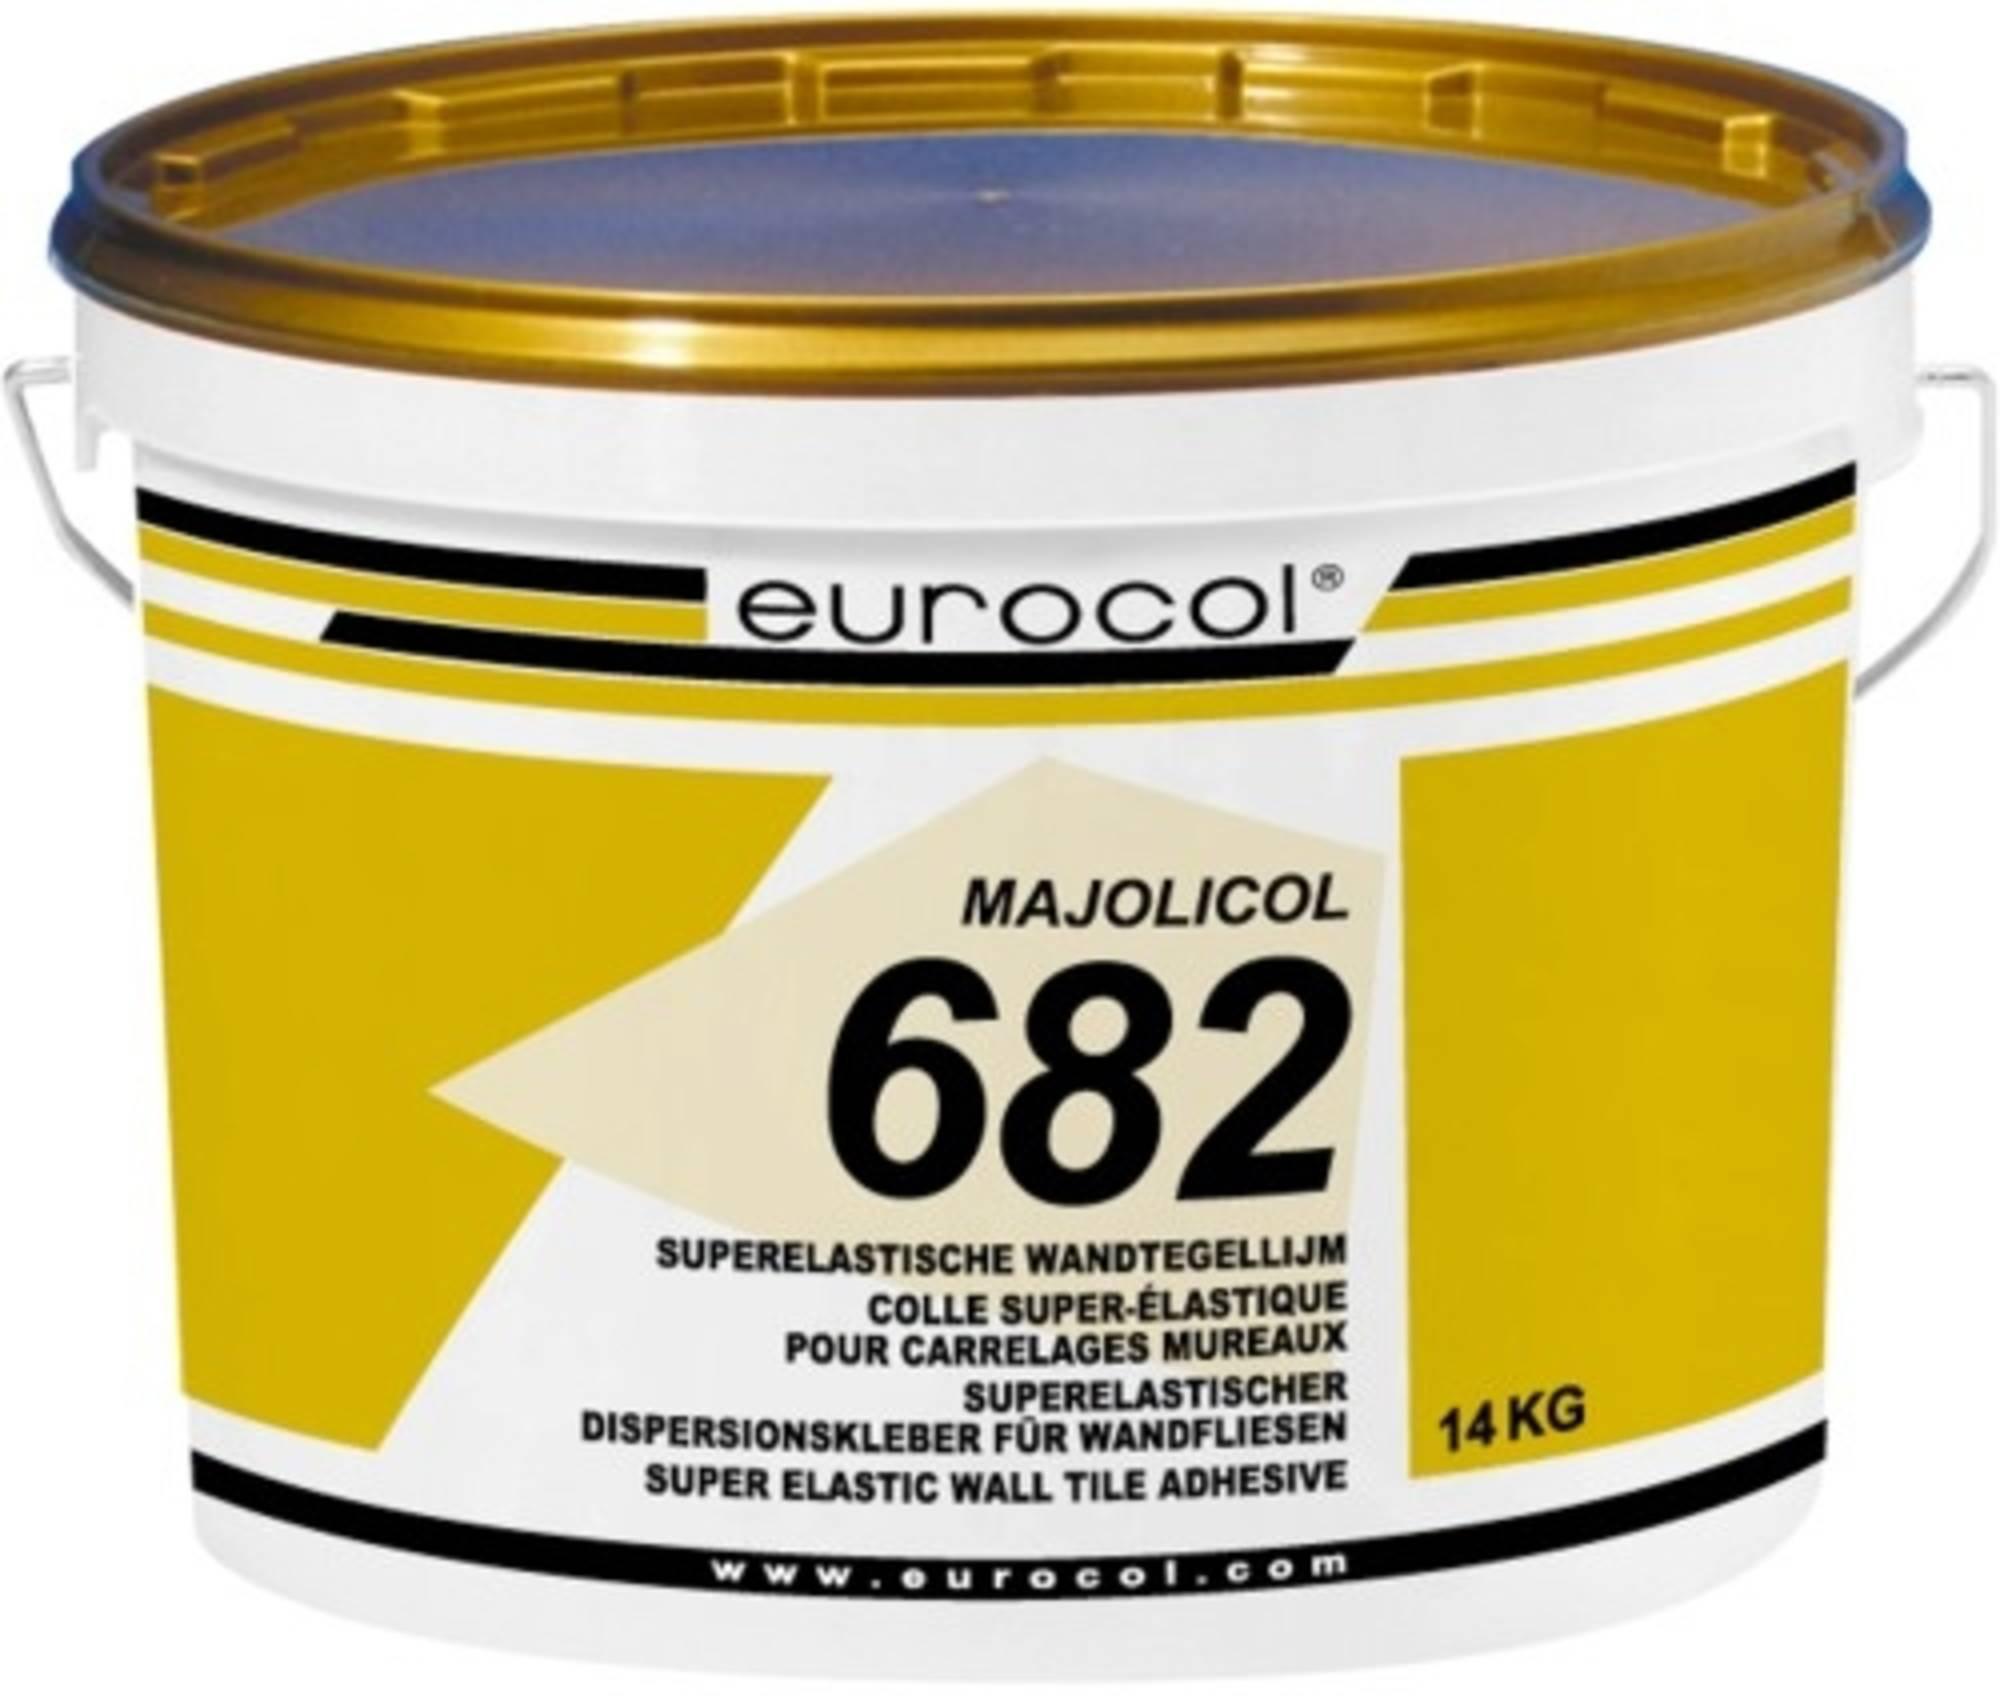 EUROCOL MAJOLICOL pasta tegellijm emmer a 14 kg. (6821)